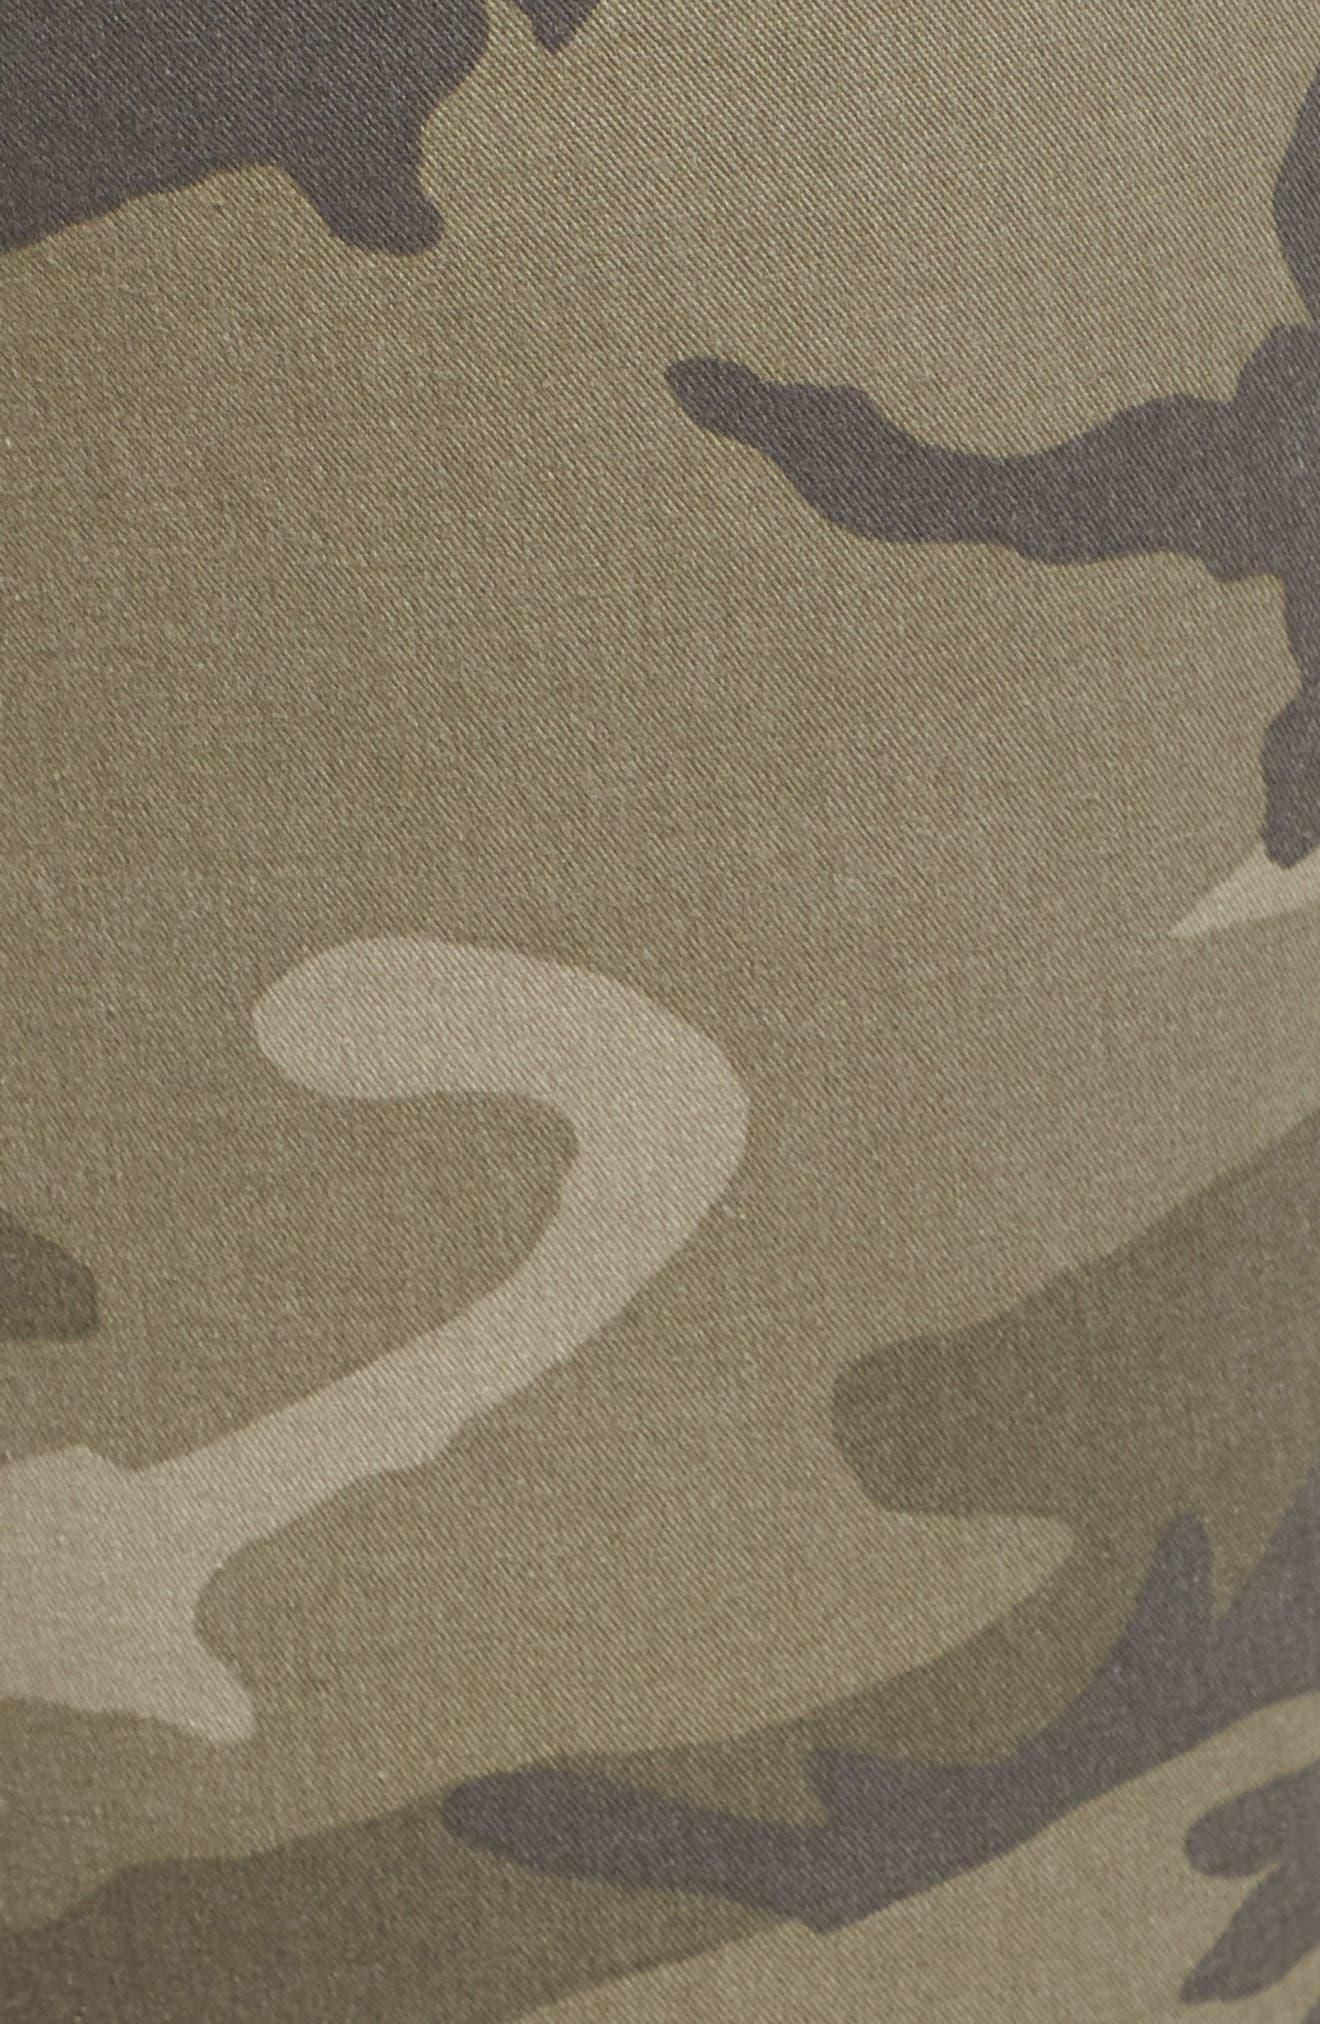 Camo Denim Pants,                             Alternate thumbnail 5, color,                             Olive Green